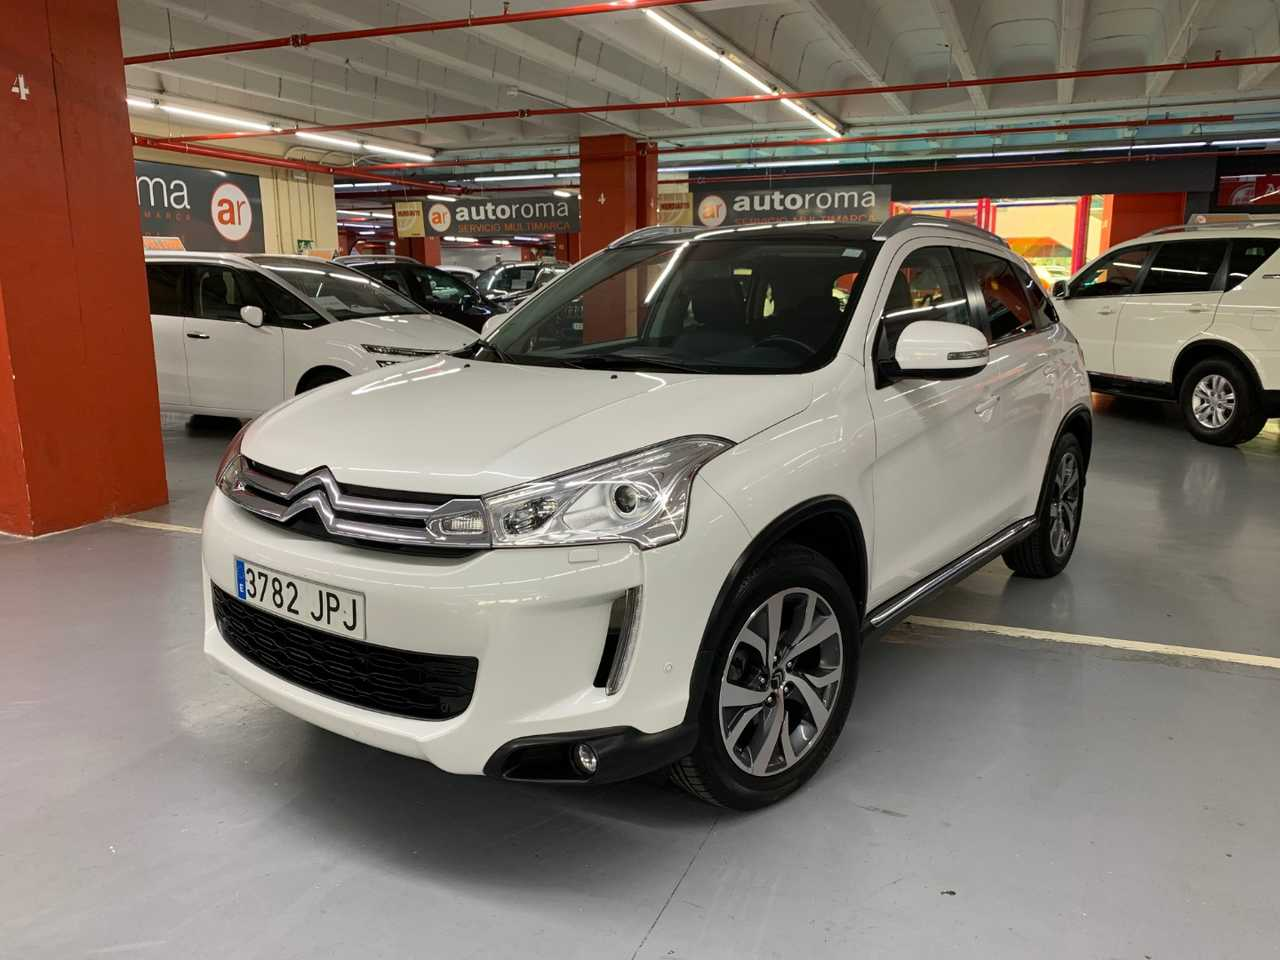 Citroën C4 Aircross Hdi EXCLUSIVE. TECHO PANORÁMICO, GPS, CÁMARA, ETC...   - Foto 1